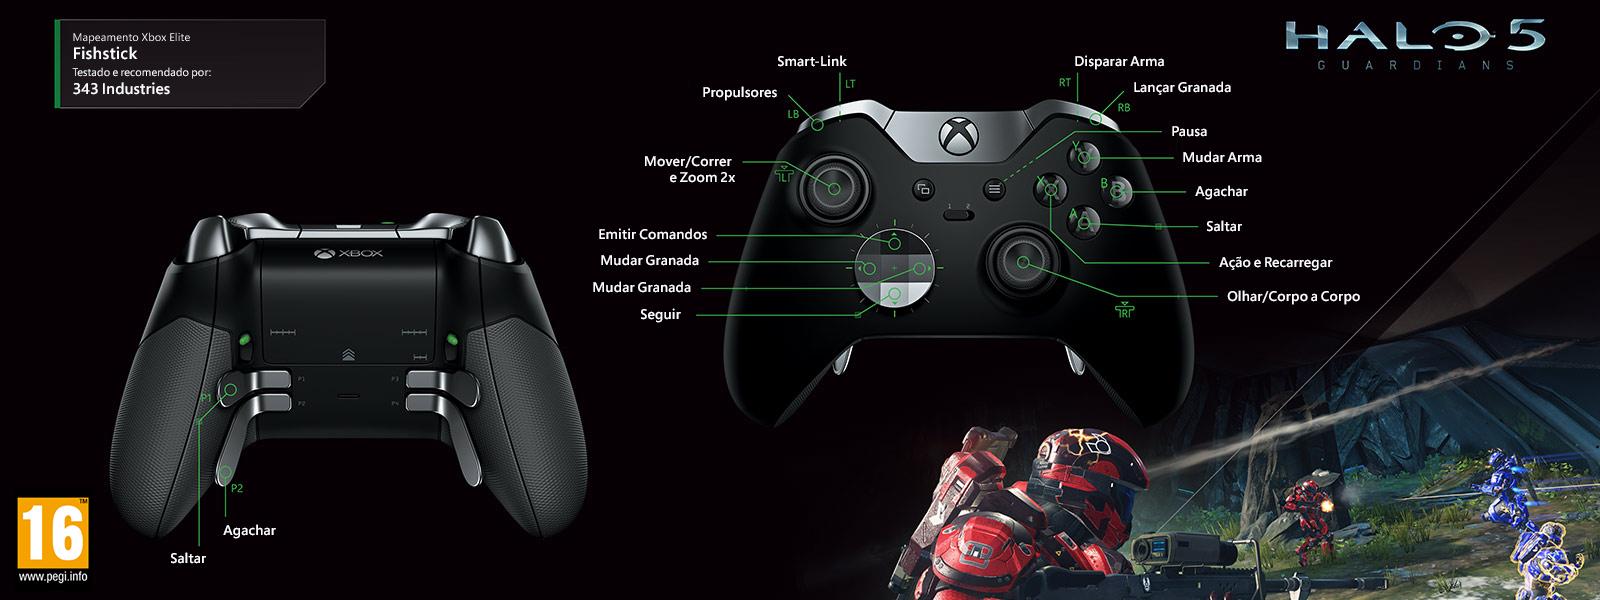 Mapeamento Elite para Halo 5 – Fishstick